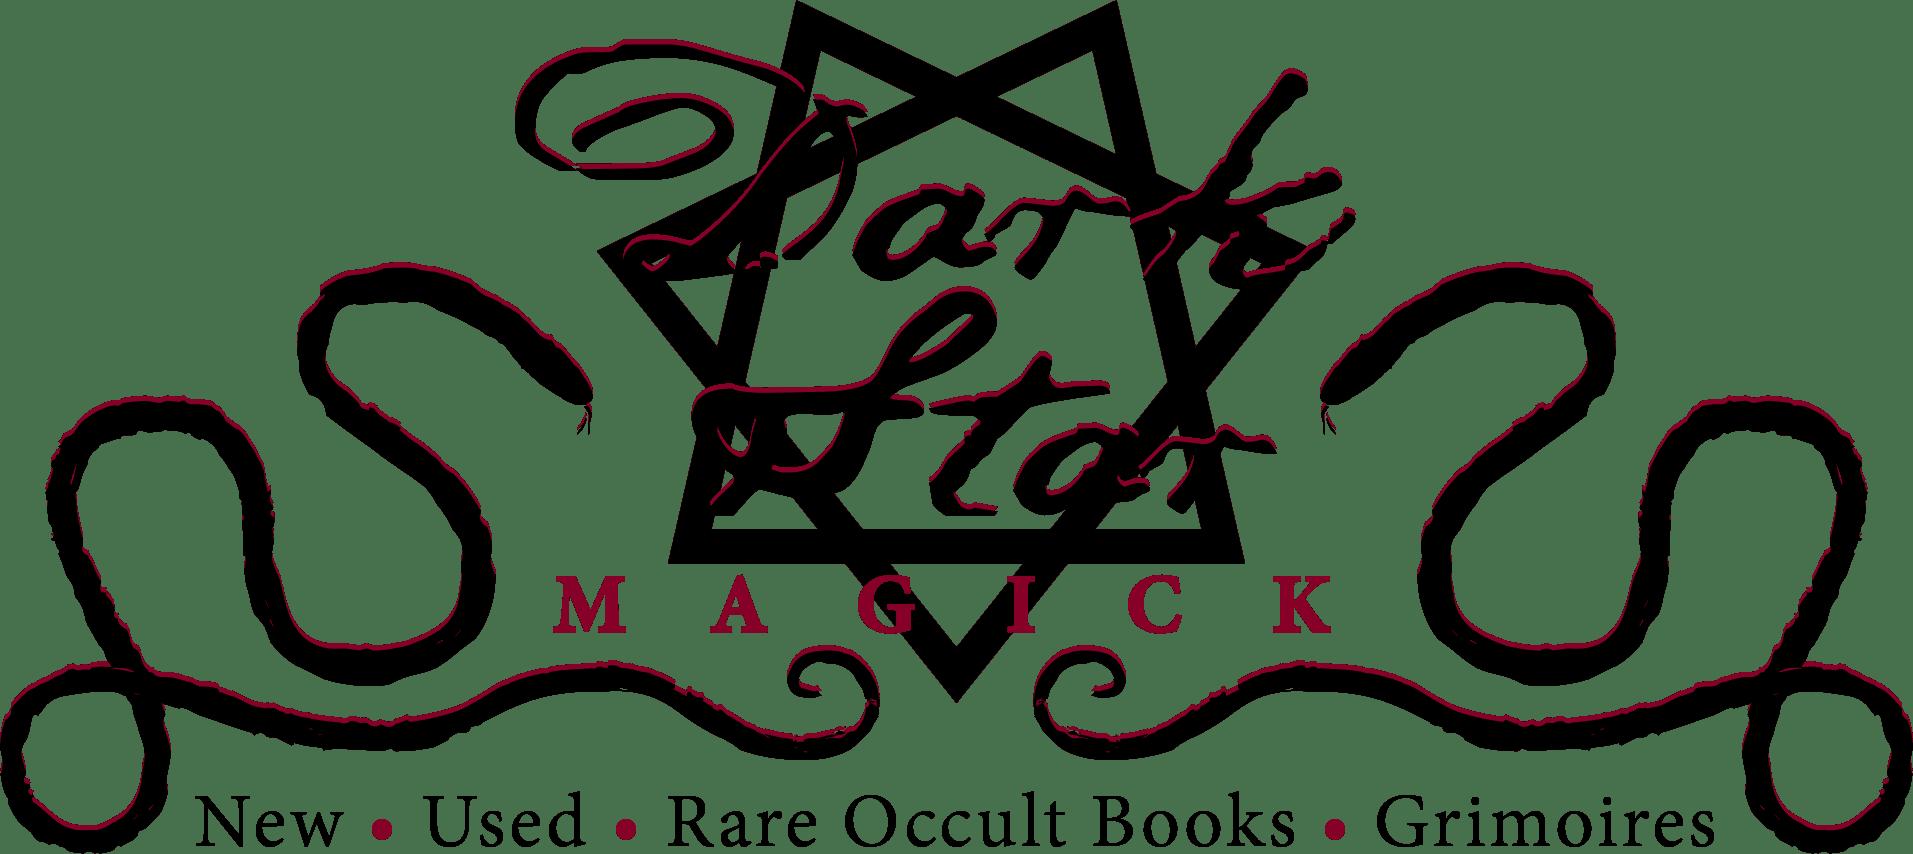 Dark Star Magick ~ New, Used, Rare Antiquarian Occult Books